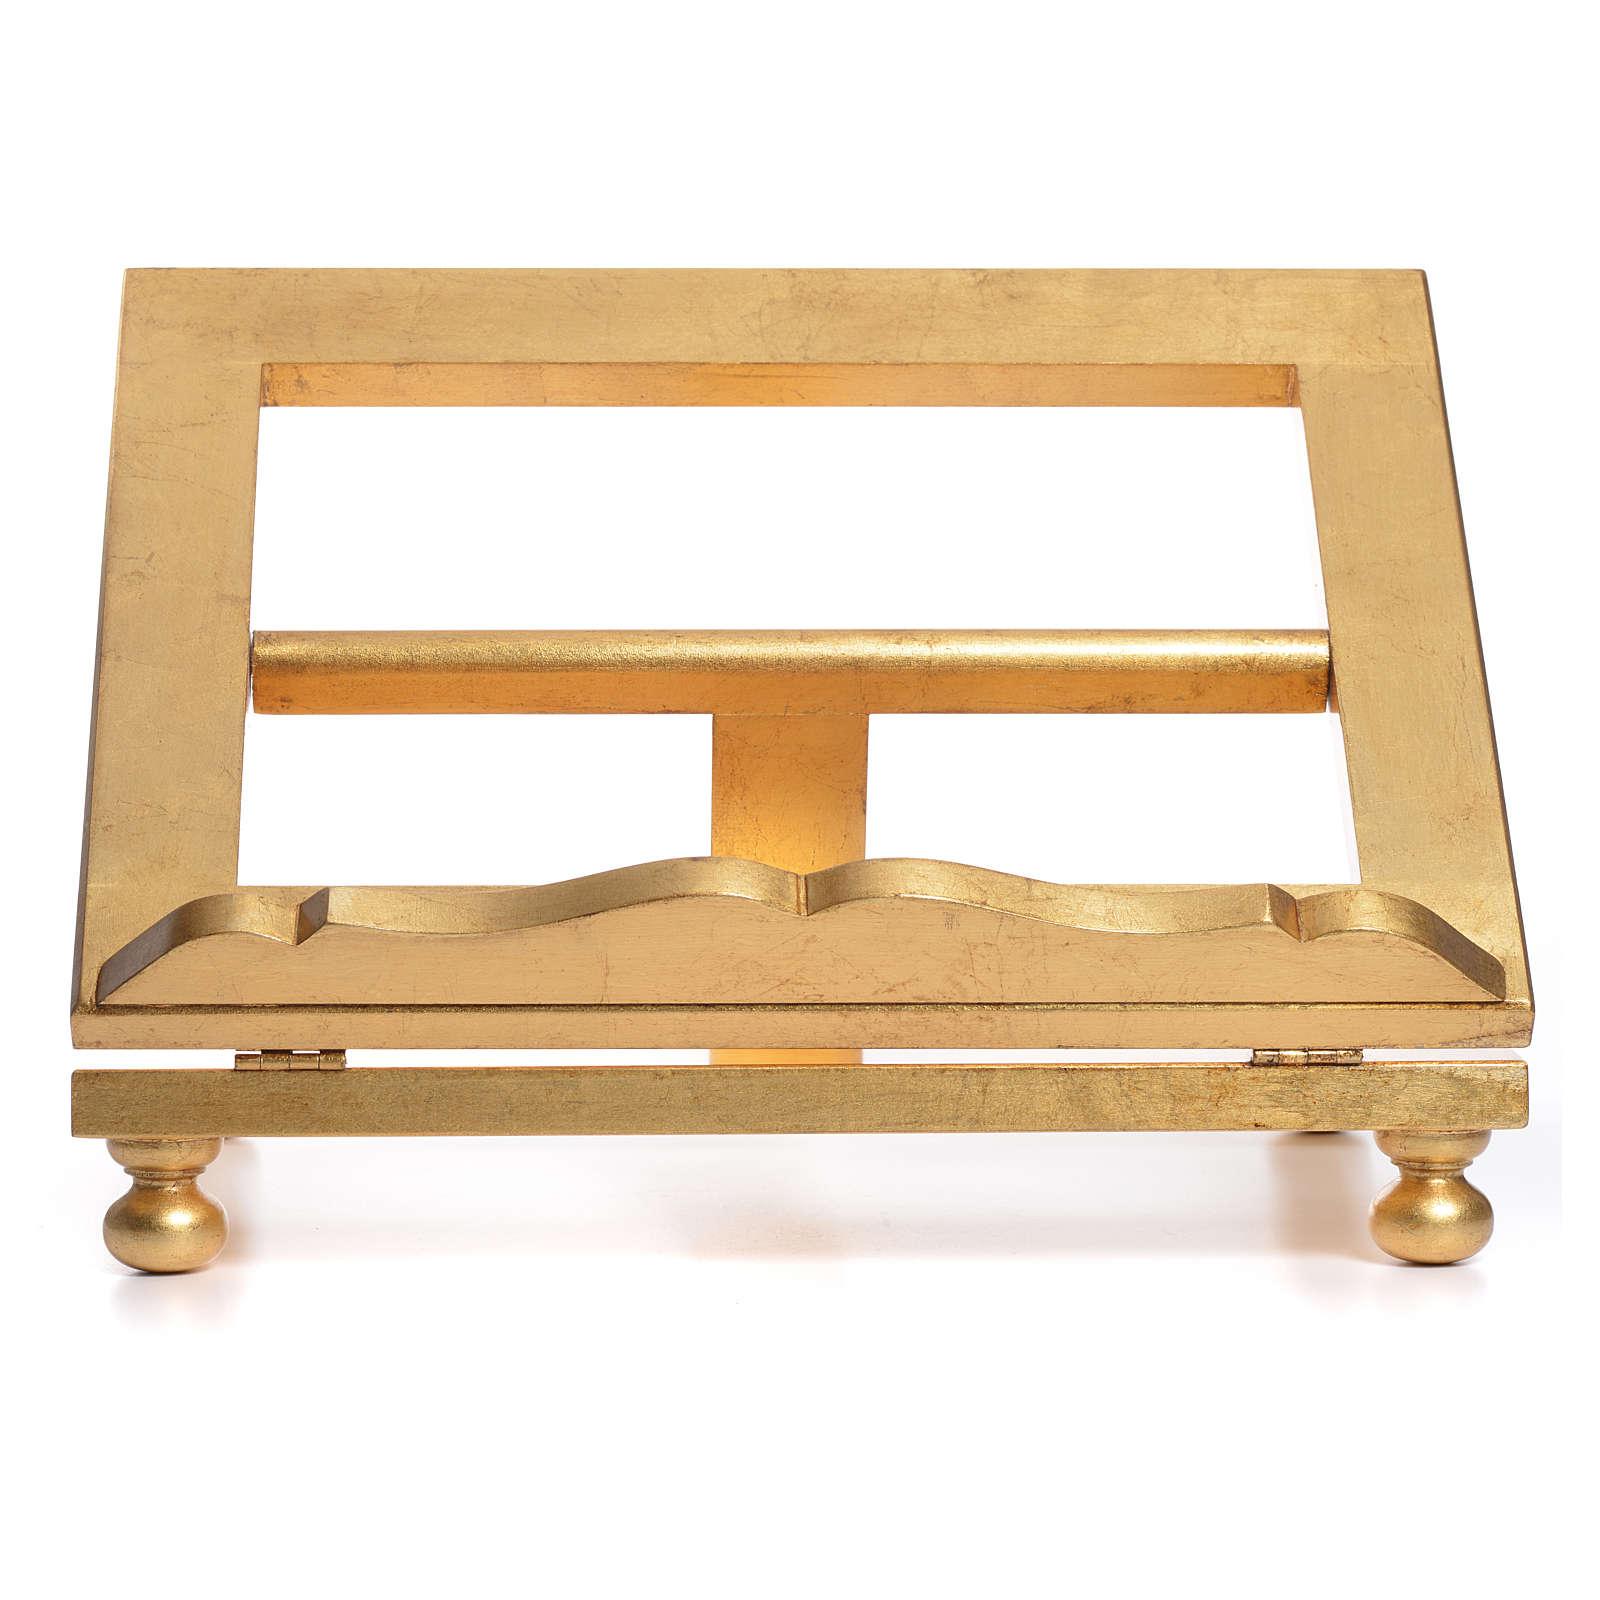 Atril de mesa hoja de oro 35x40 cm 4